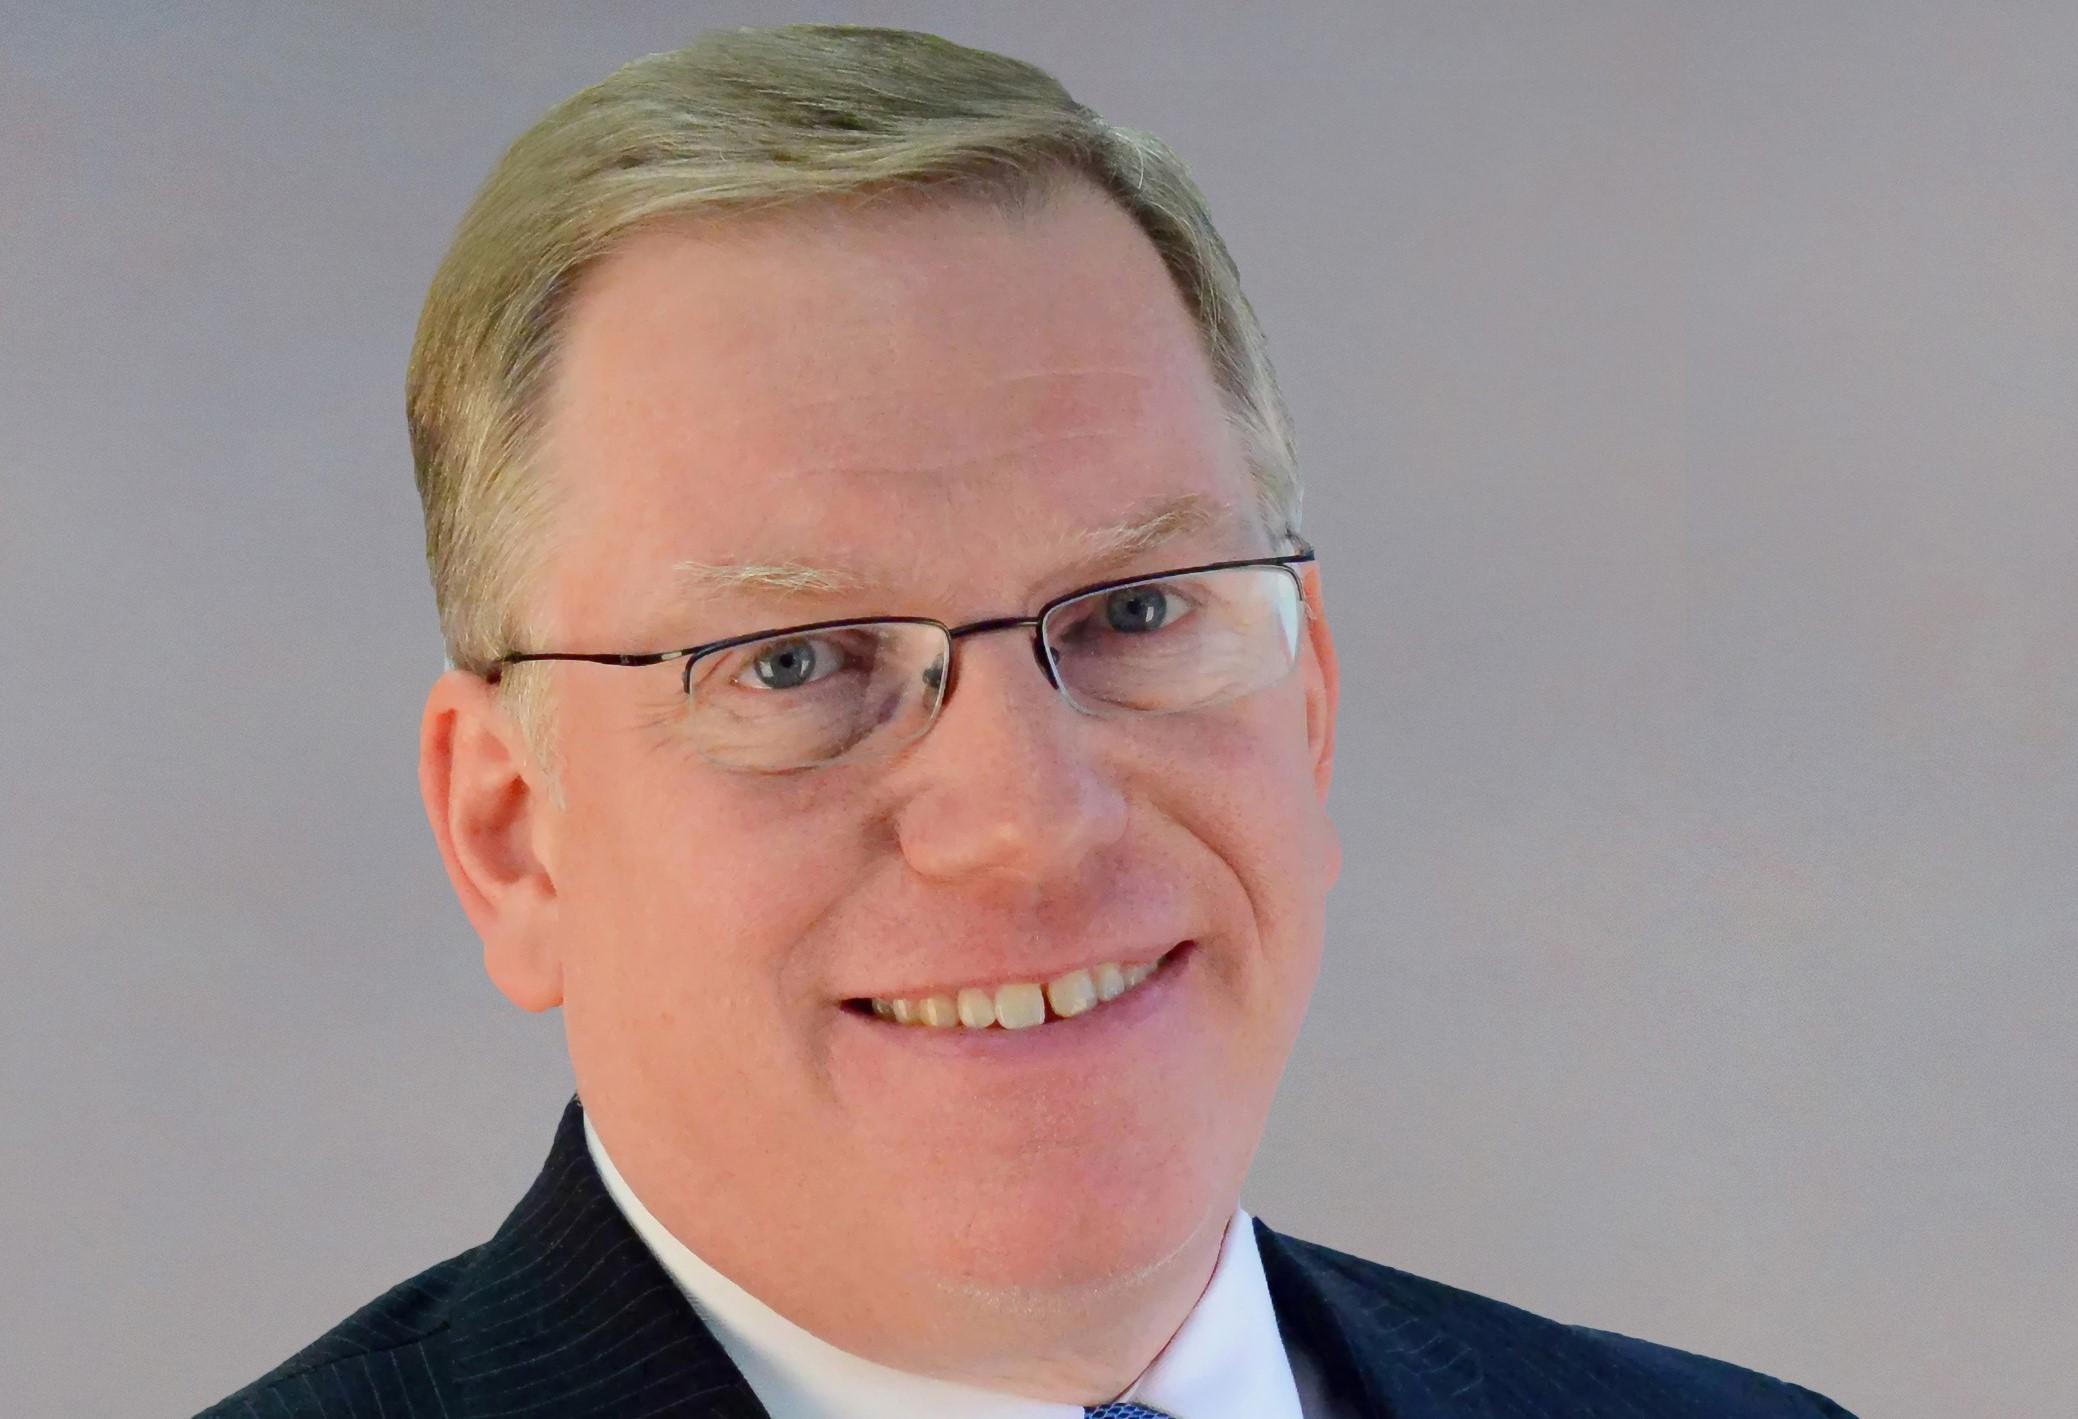 WILLIAM LYON Financial Advisor